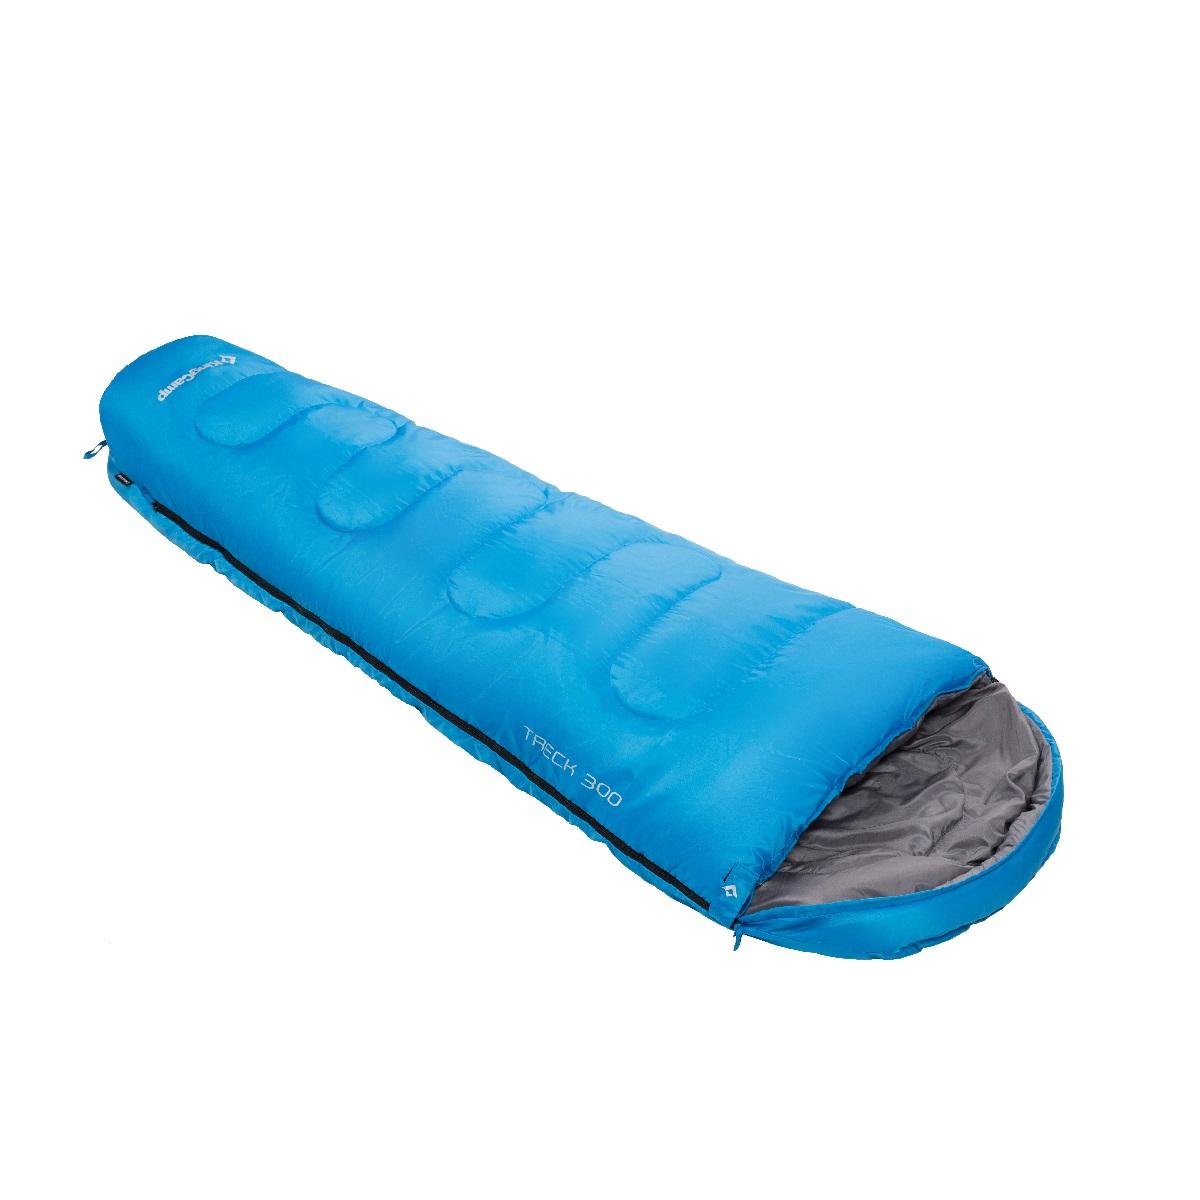 Spací pytel KING CAMP Trek 300 modrý - levý zip